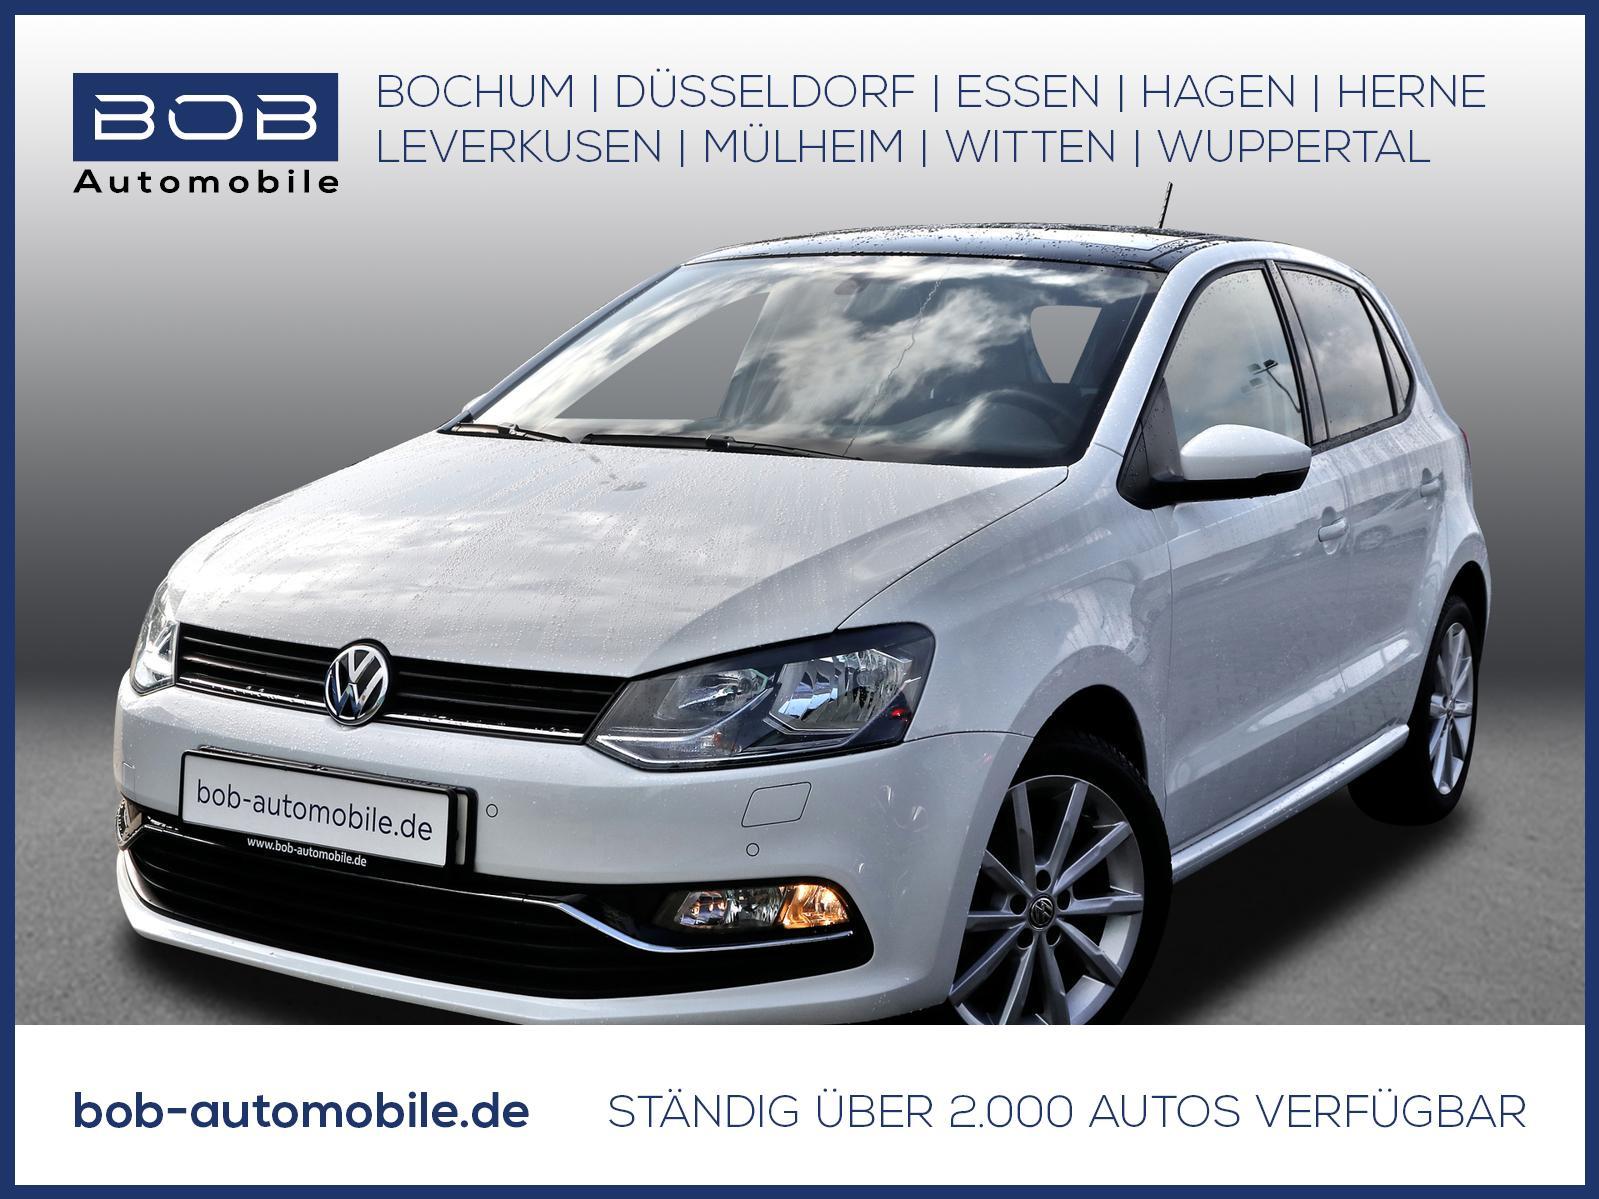 Volkswagen Polo 1.2 TSi Highline KLIMA SHZ PDC LM PANO ZV, Jahr 2017, Benzin